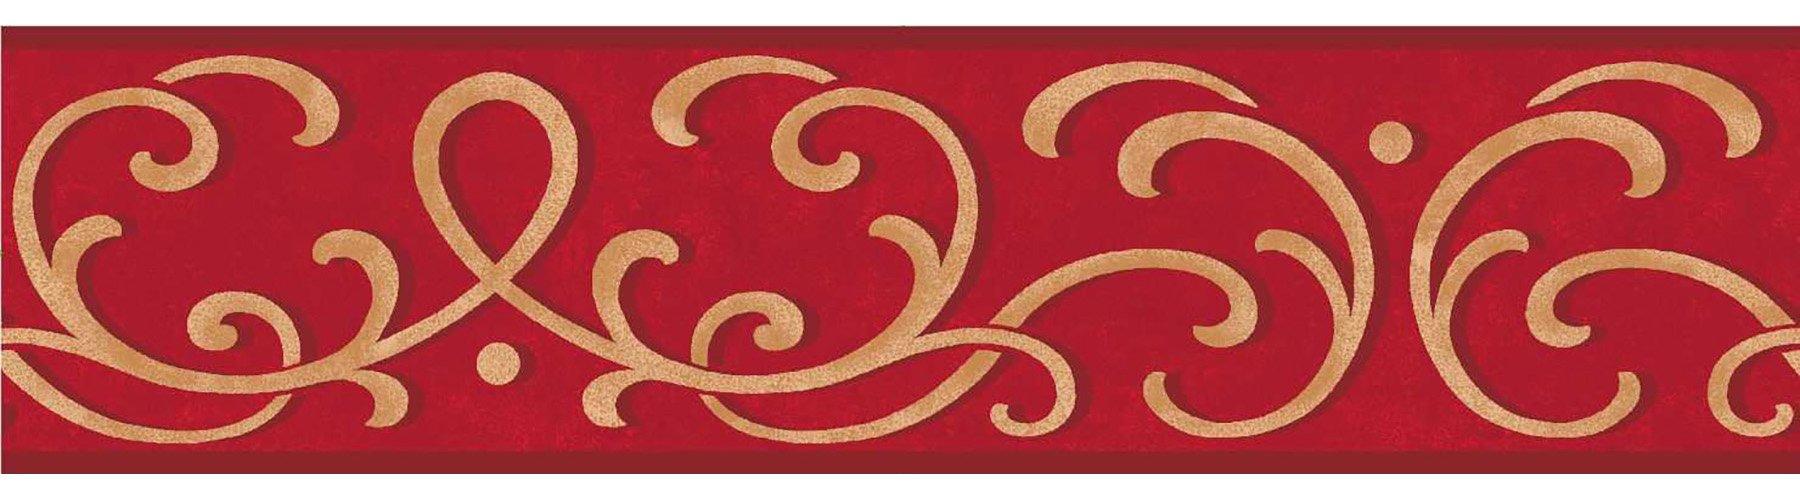 Fine Decor FDB07503S Red Carmen Peel & Stick Border